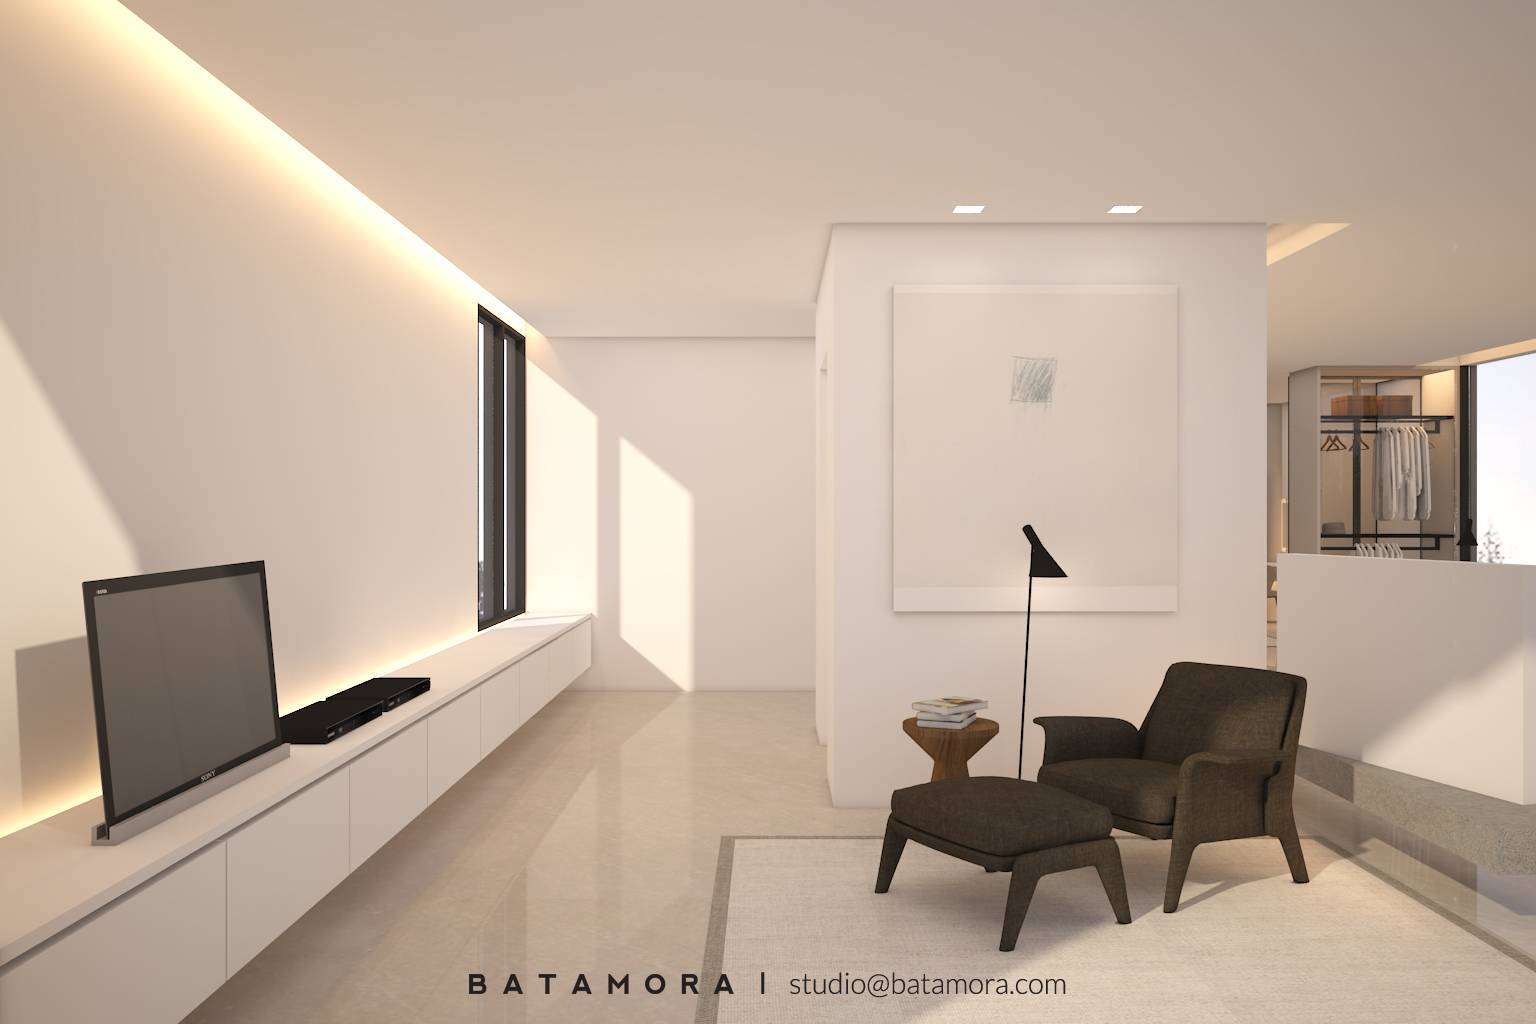 Batamora Martimbang House At Kebayoran Baru Jakarta Jakarta Master Bedroom   2697